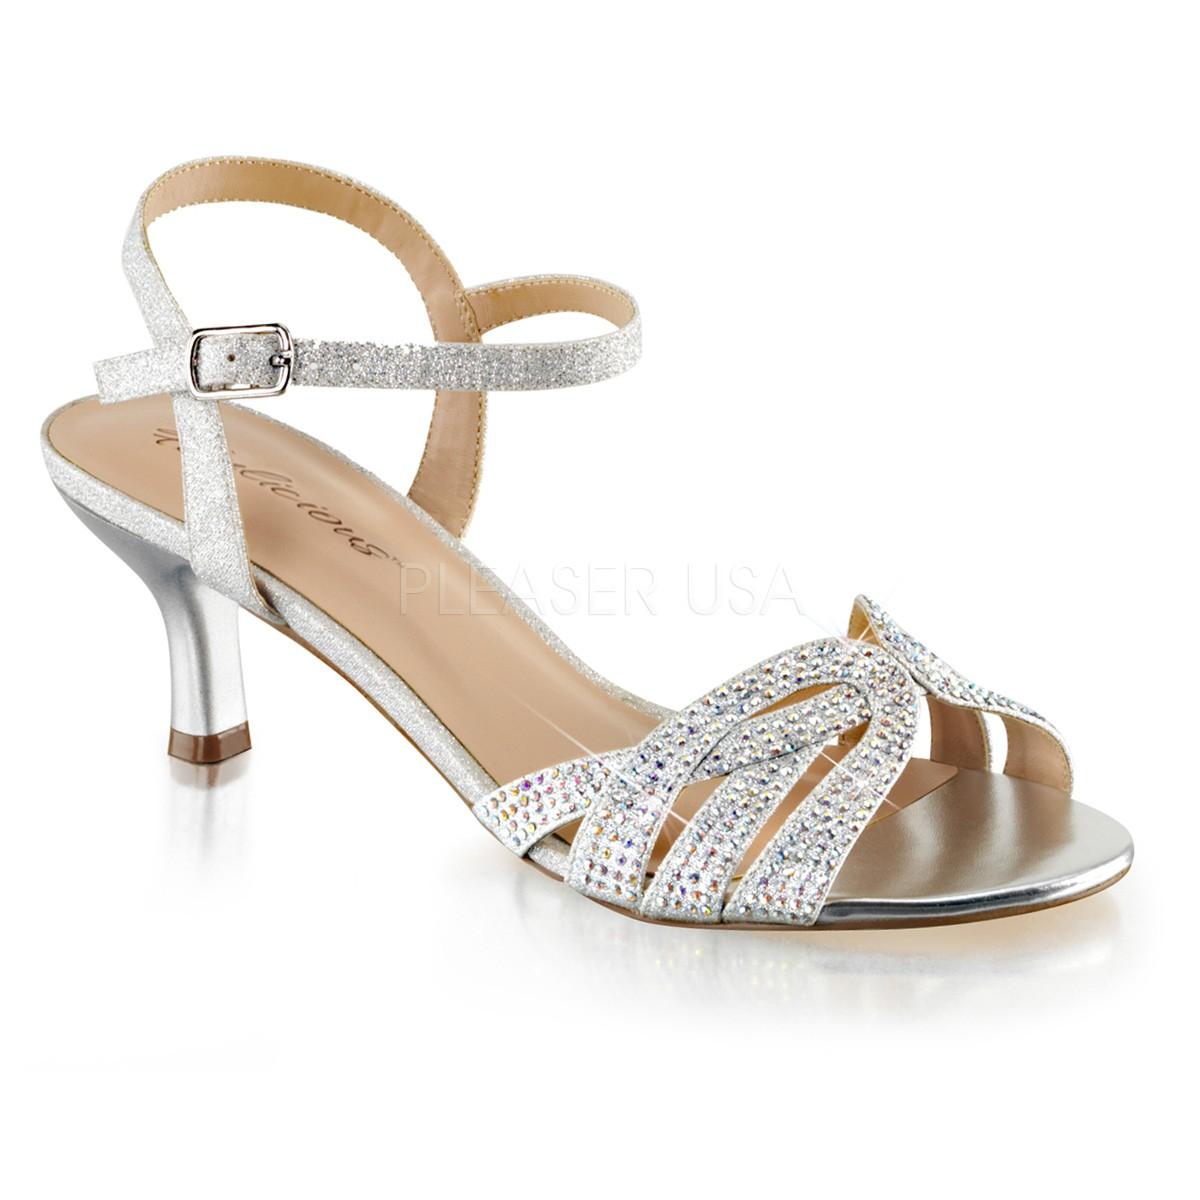 Sandale strass argent - Pointure : 37